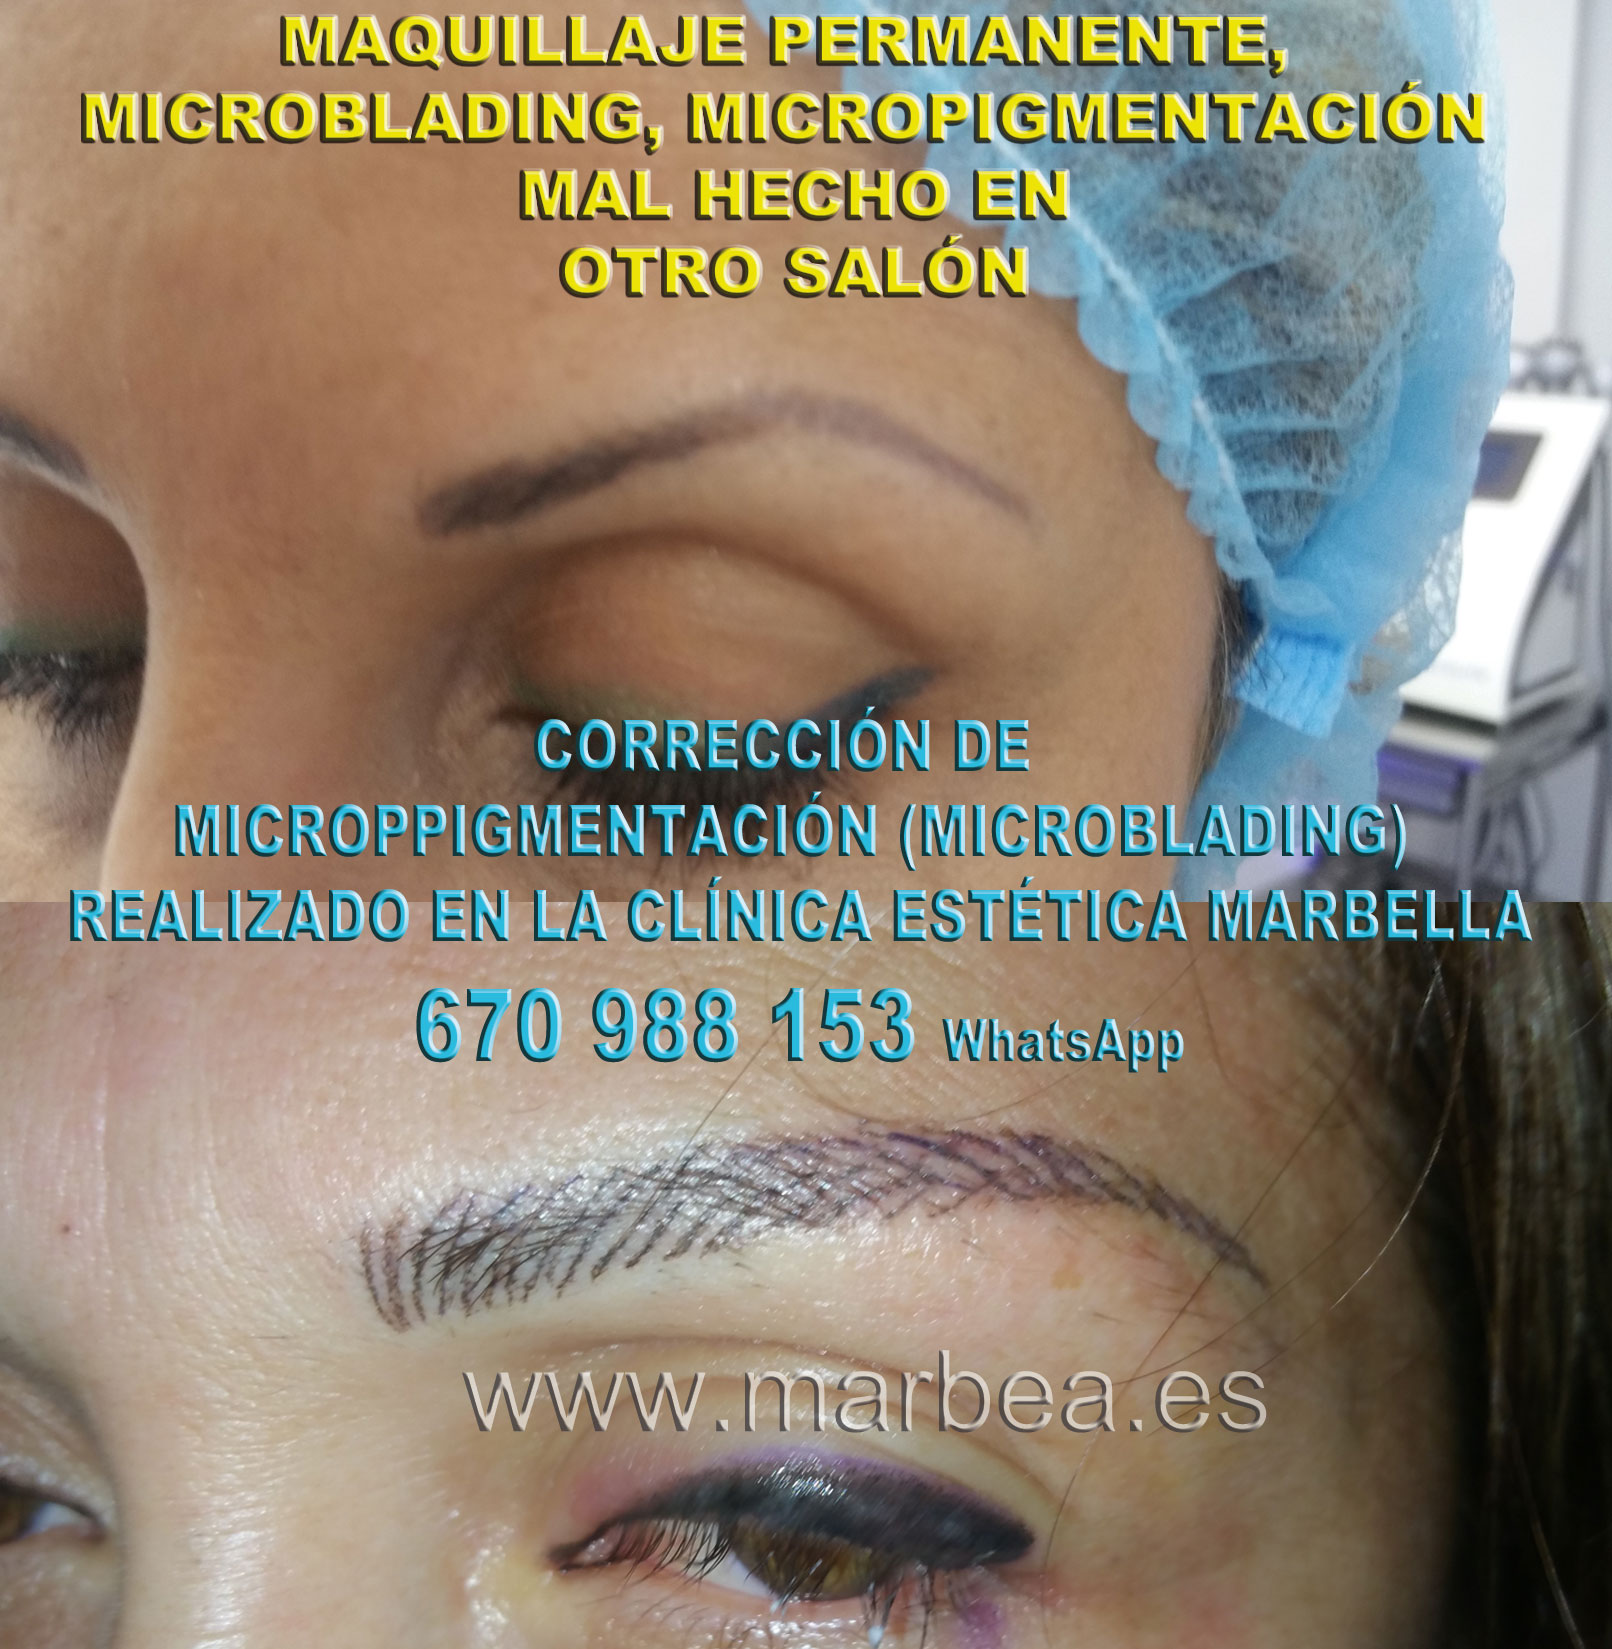 ELIMINAR TATUAJE CEJAS clínica estética maquillaje semipermanente entrega corrección de cejas mal tatuadas,corregir micropigmentación no deseada